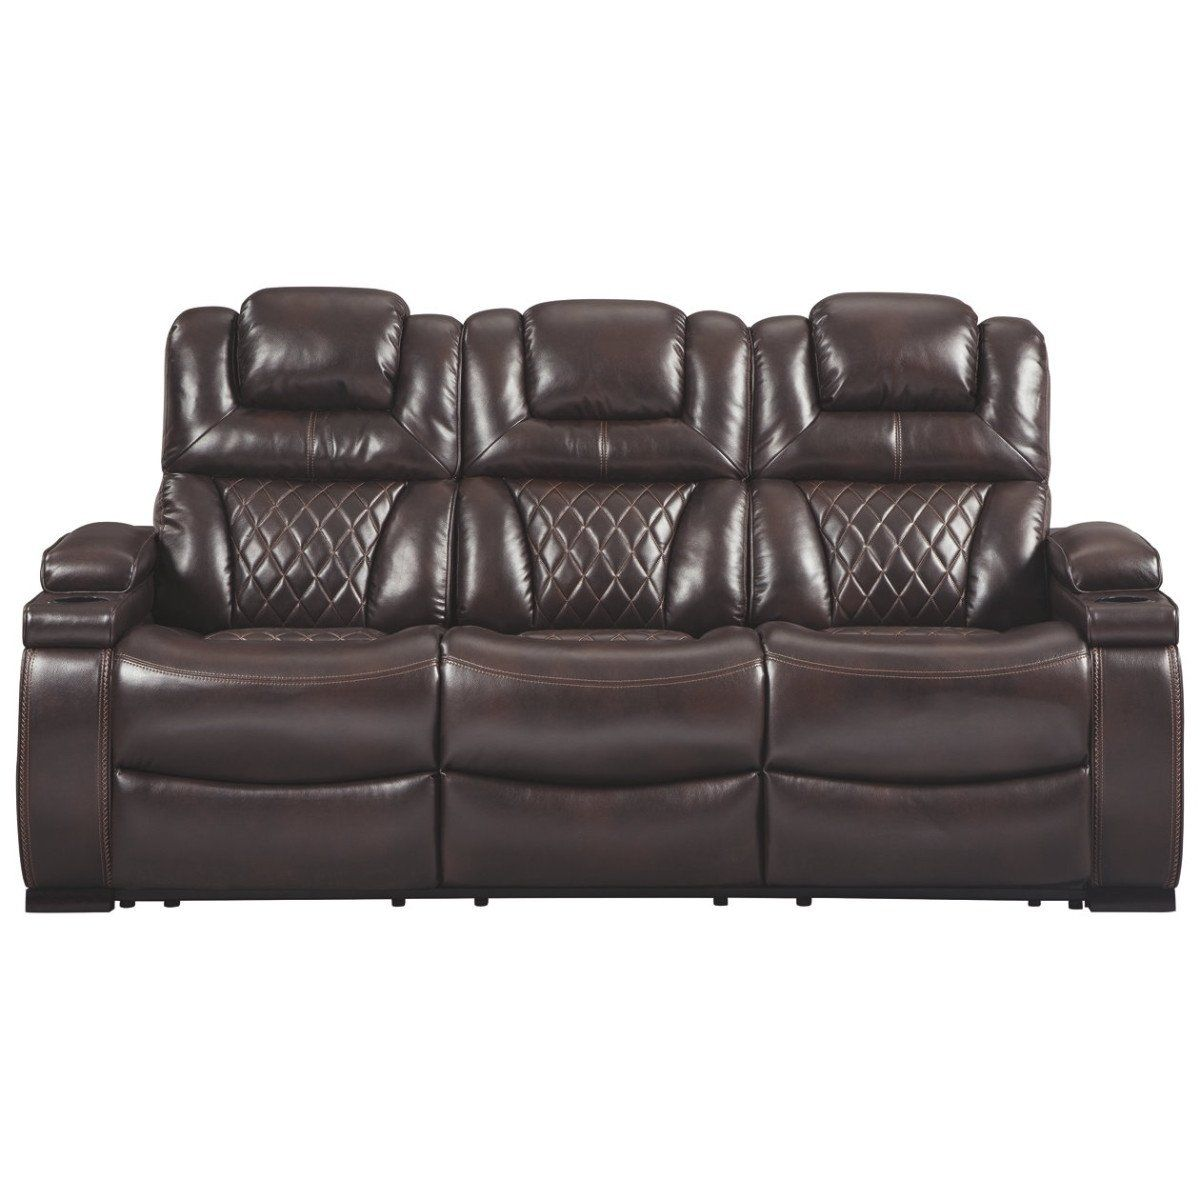 Fine Leatherette Upholstered Metal Power Reclining Sofa With Creativecarmelina Interior Chair Design Creativecarmelinacom